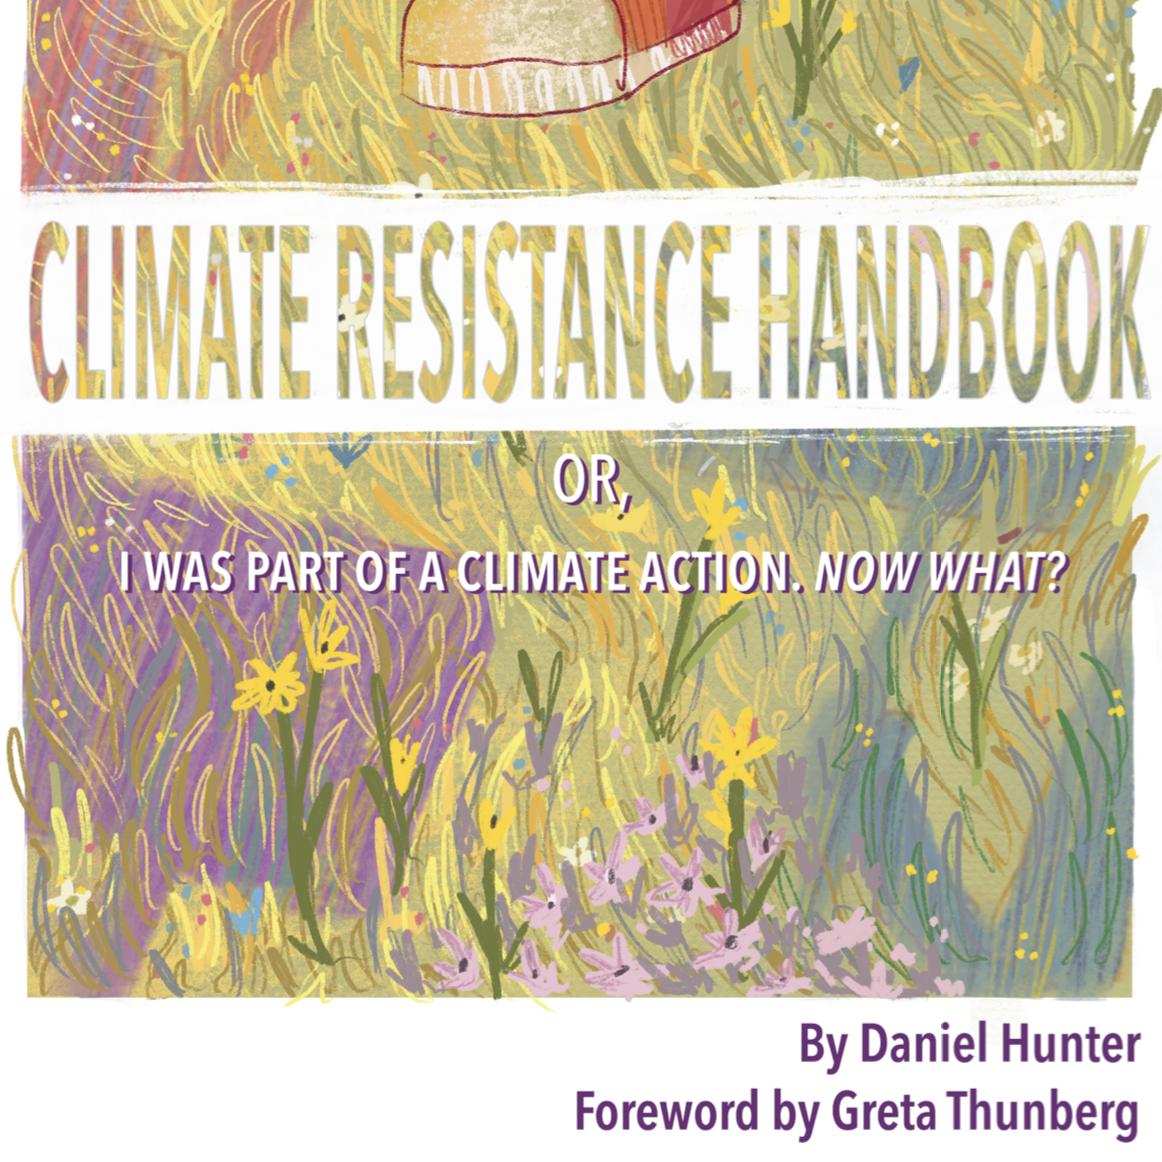 climate resistance handbook